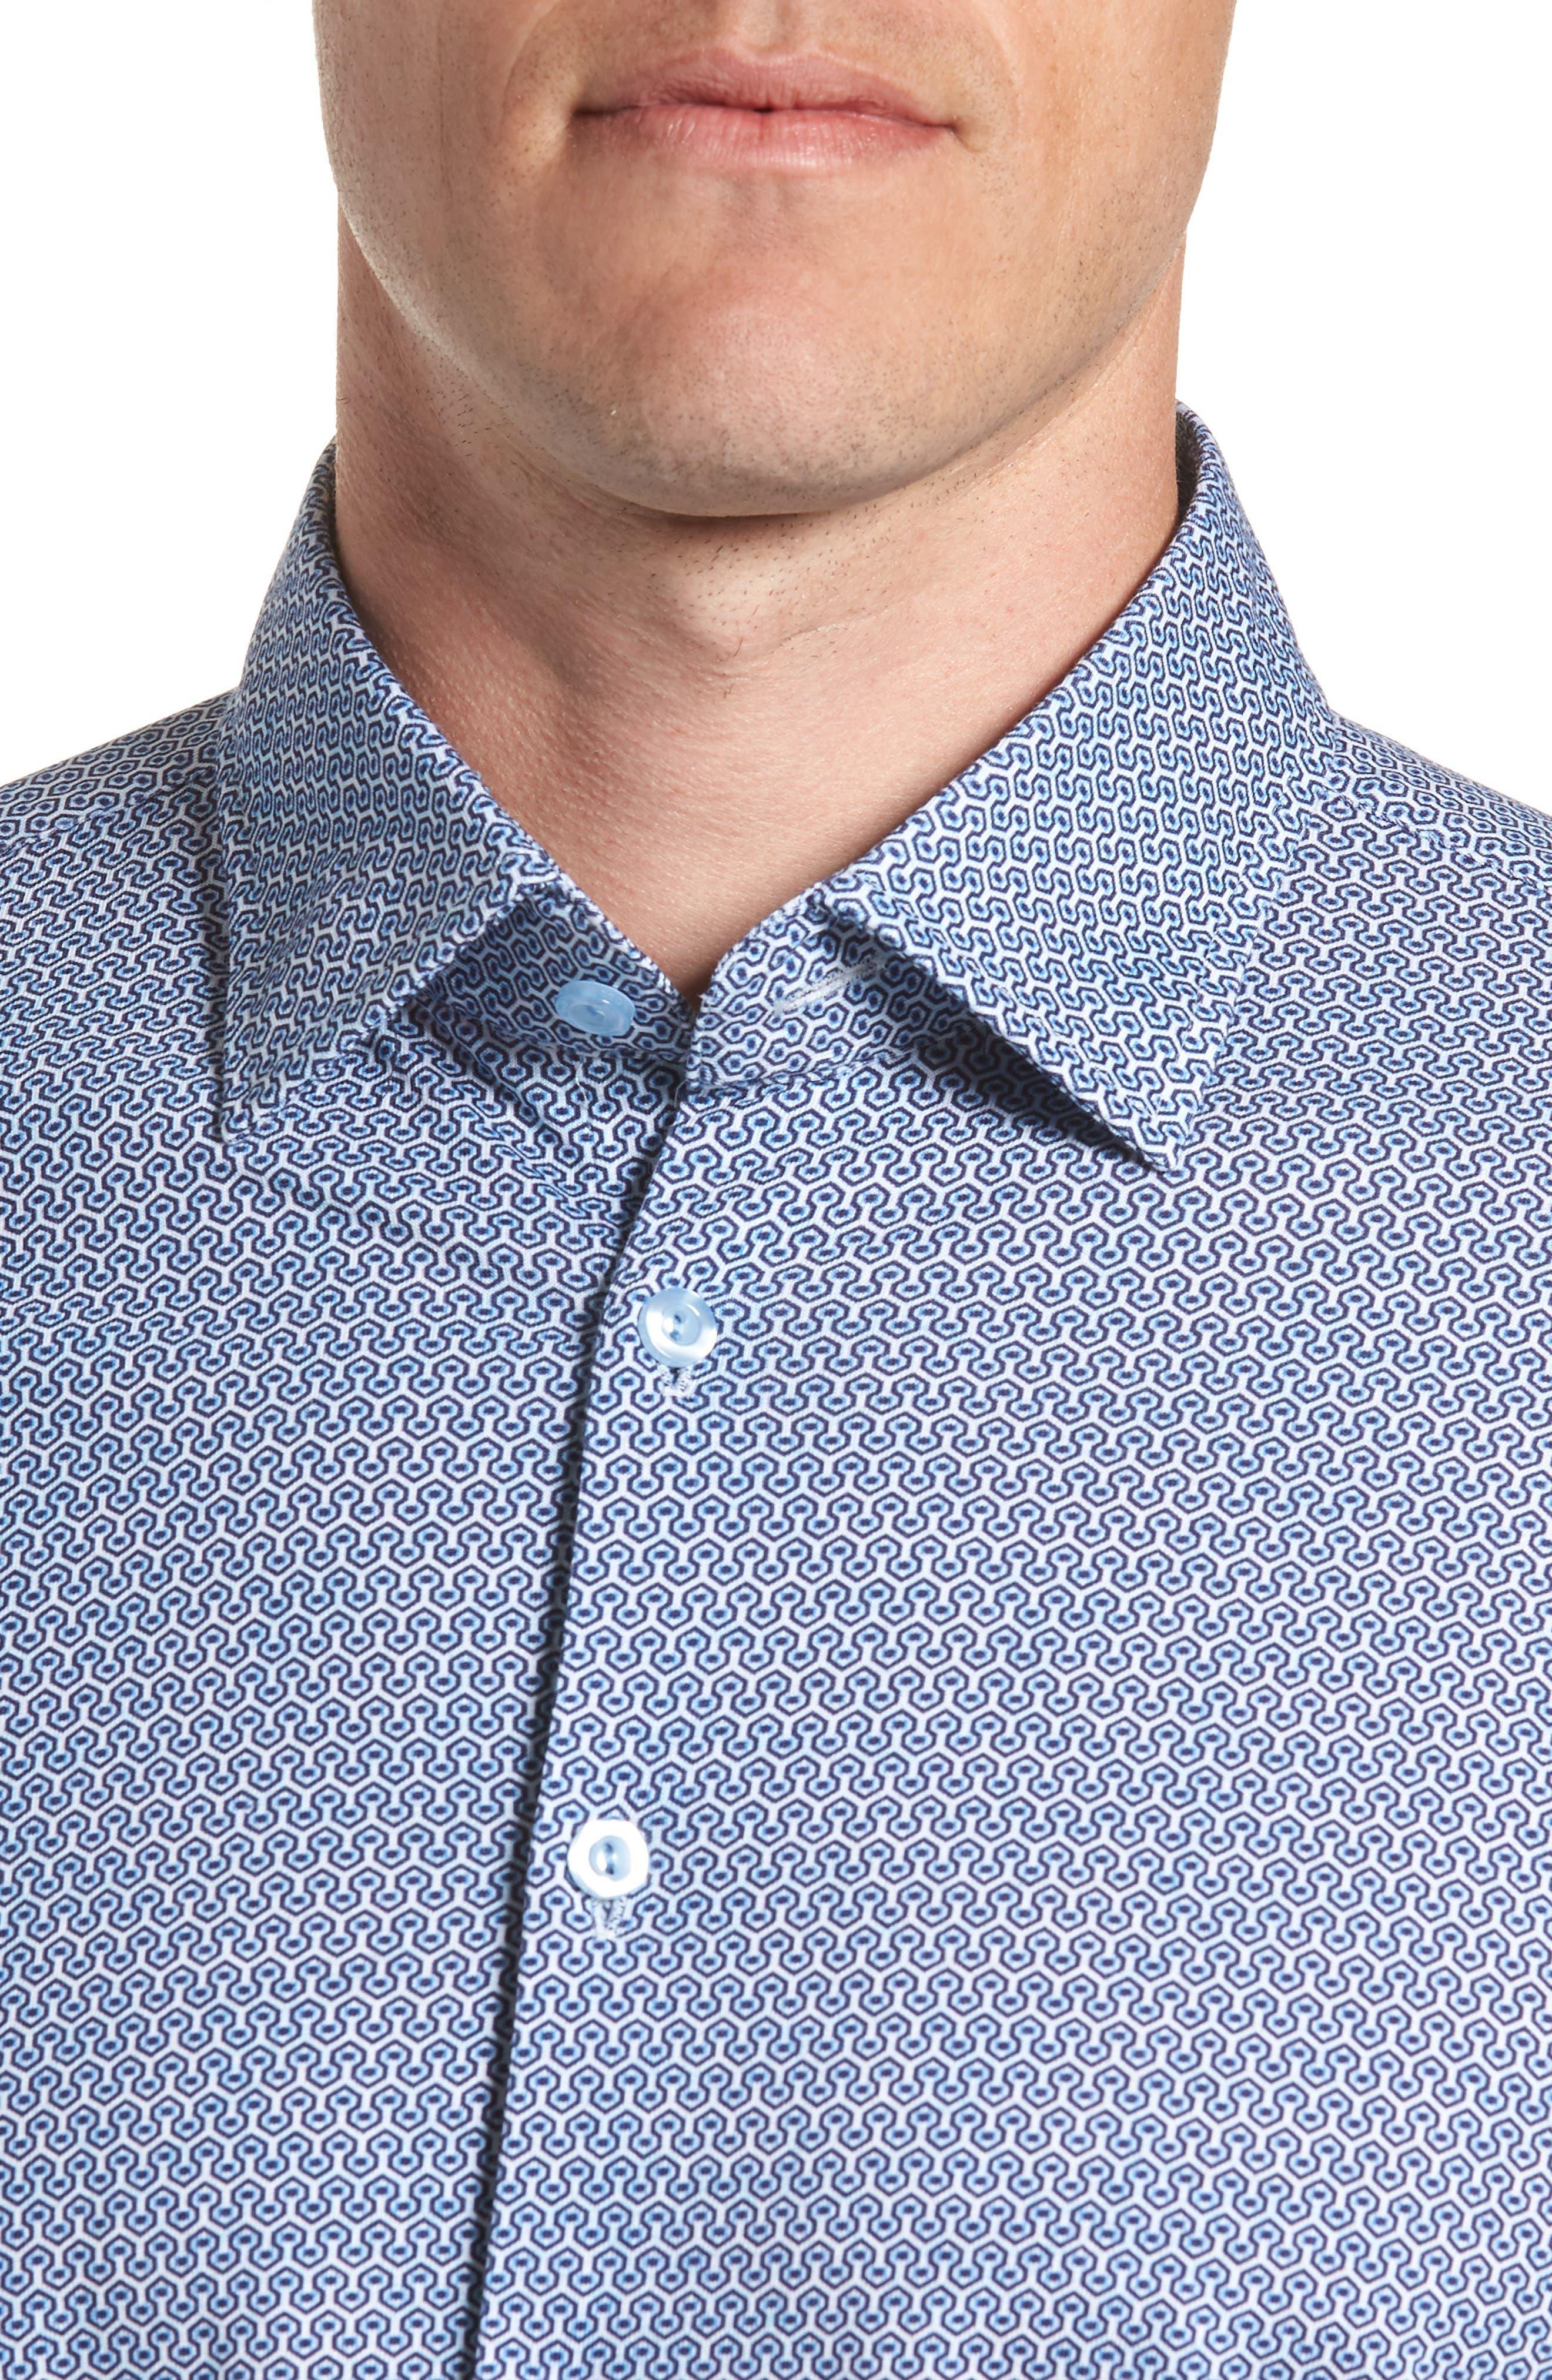 Honeycomb Print Knit Sport Shirt,                             Alternate thumbnail 2, color,                             Blue